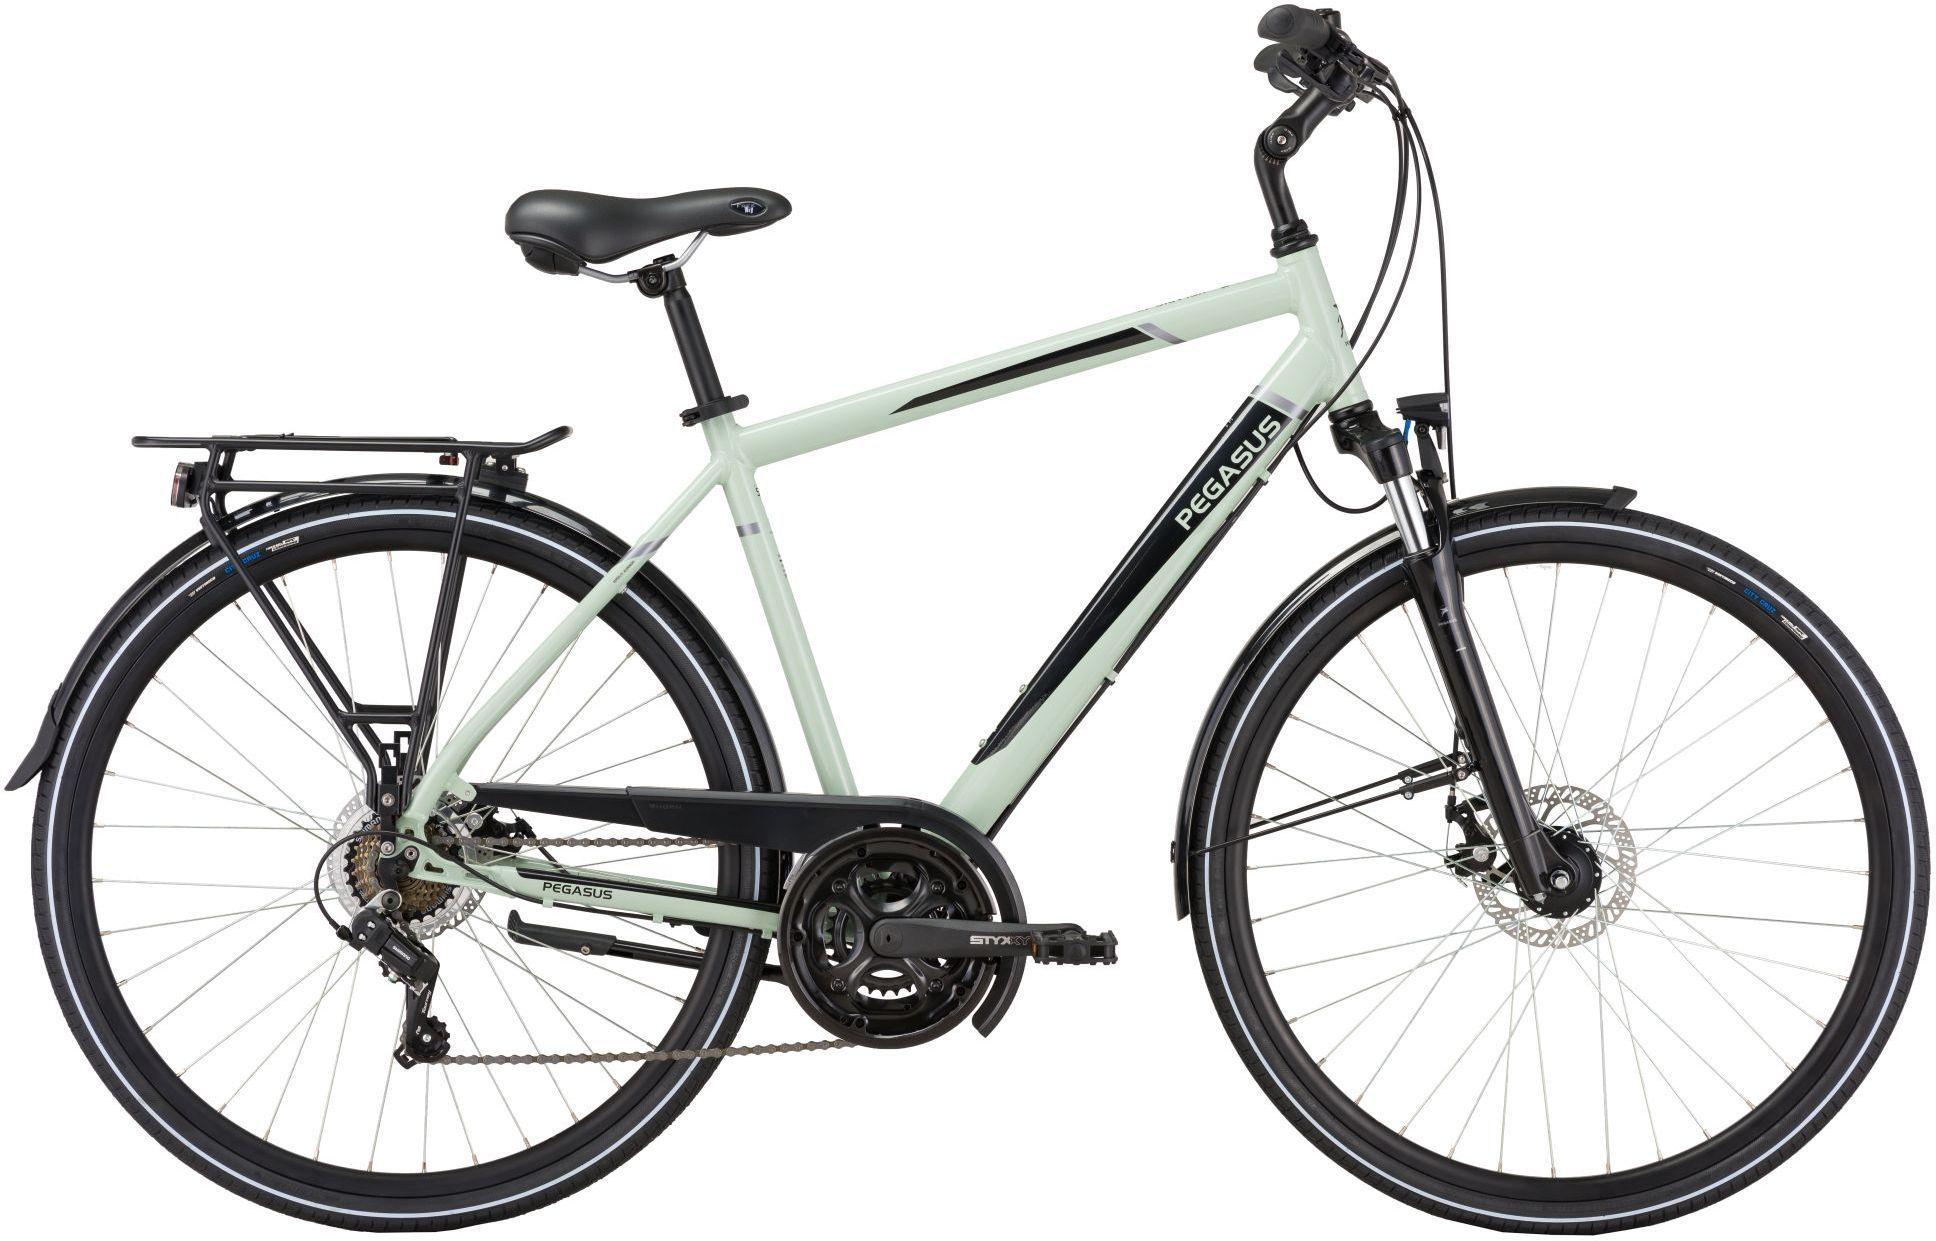 Fahrräder/Trekkingräder: Diamant  Ancura Disc 21 21 Gang Kettenschaltung Herrenfahrrad Diamant Modell 2021 28 Zoll 61 cm